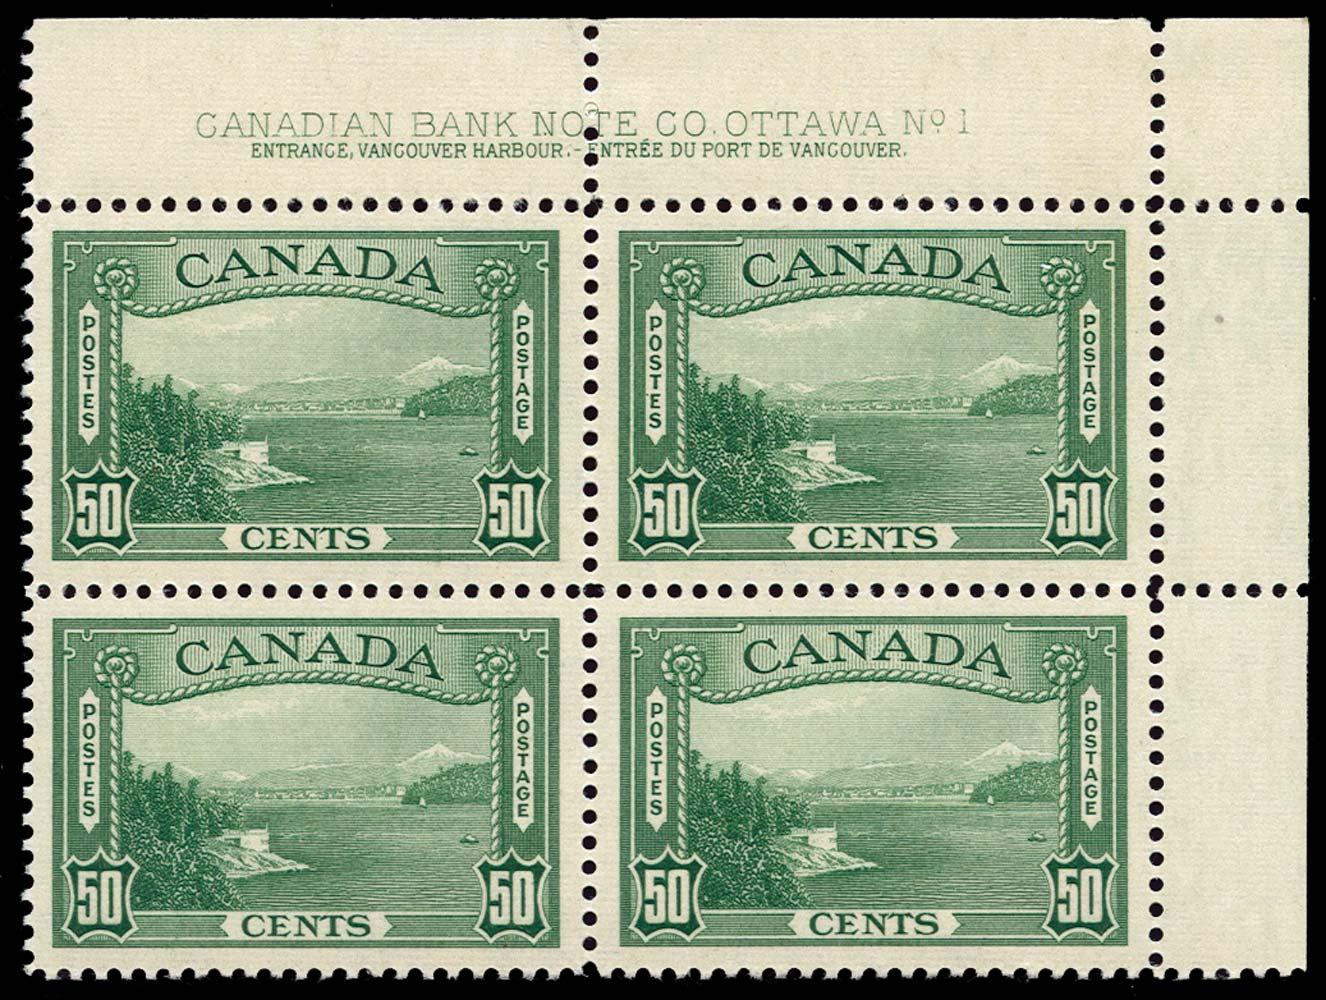 CANADA 1937  SG366 Mint